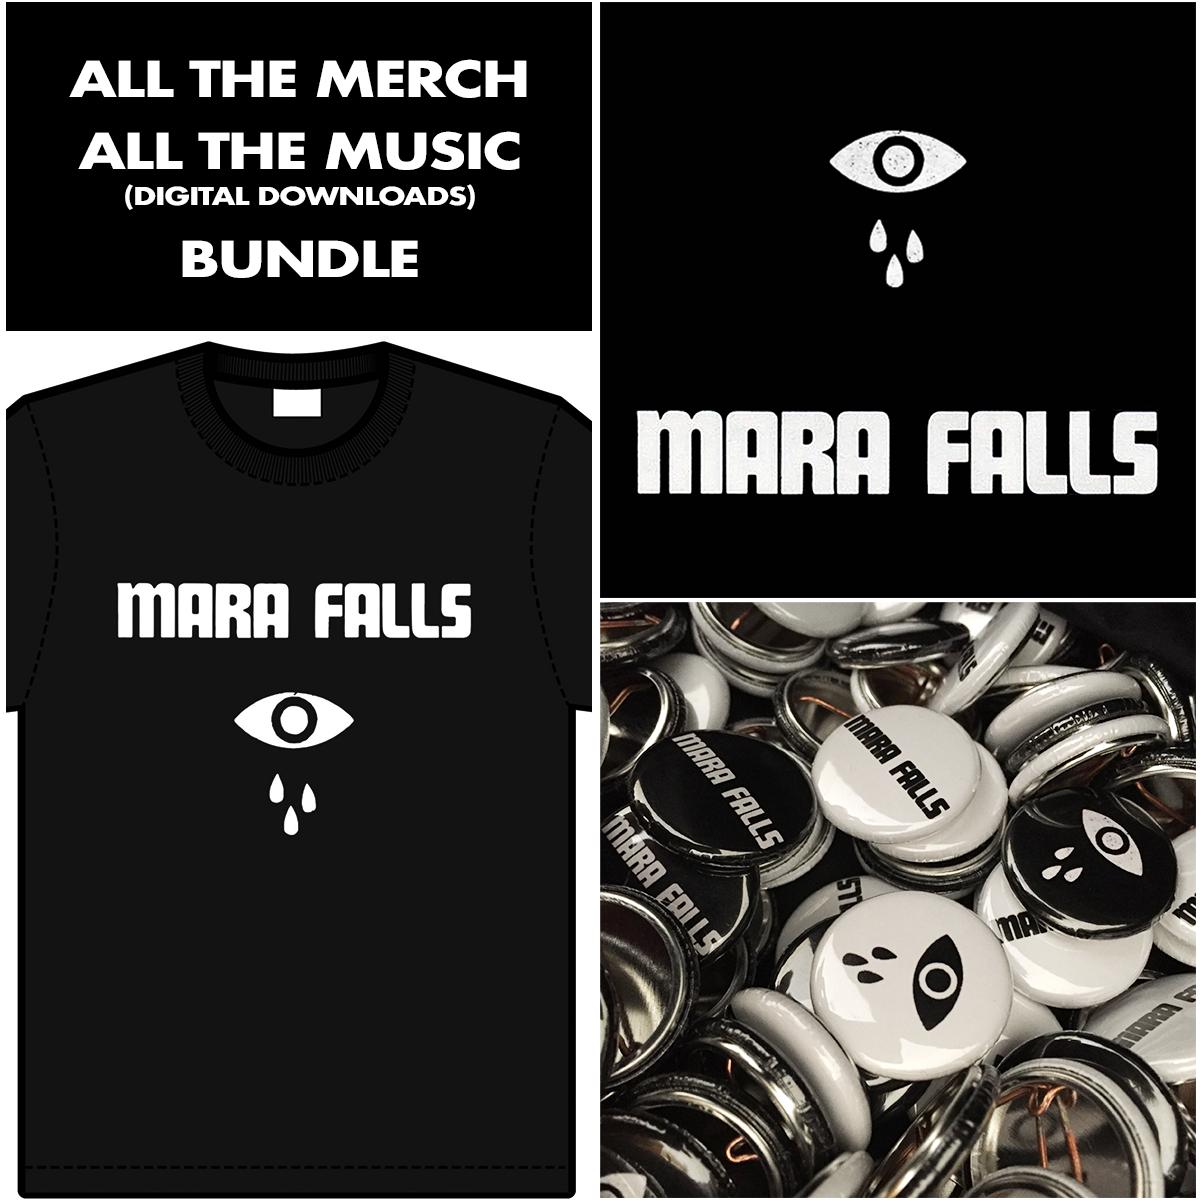 T-Shirt, Badge, Sticker, Music Bundle - Mara Falls